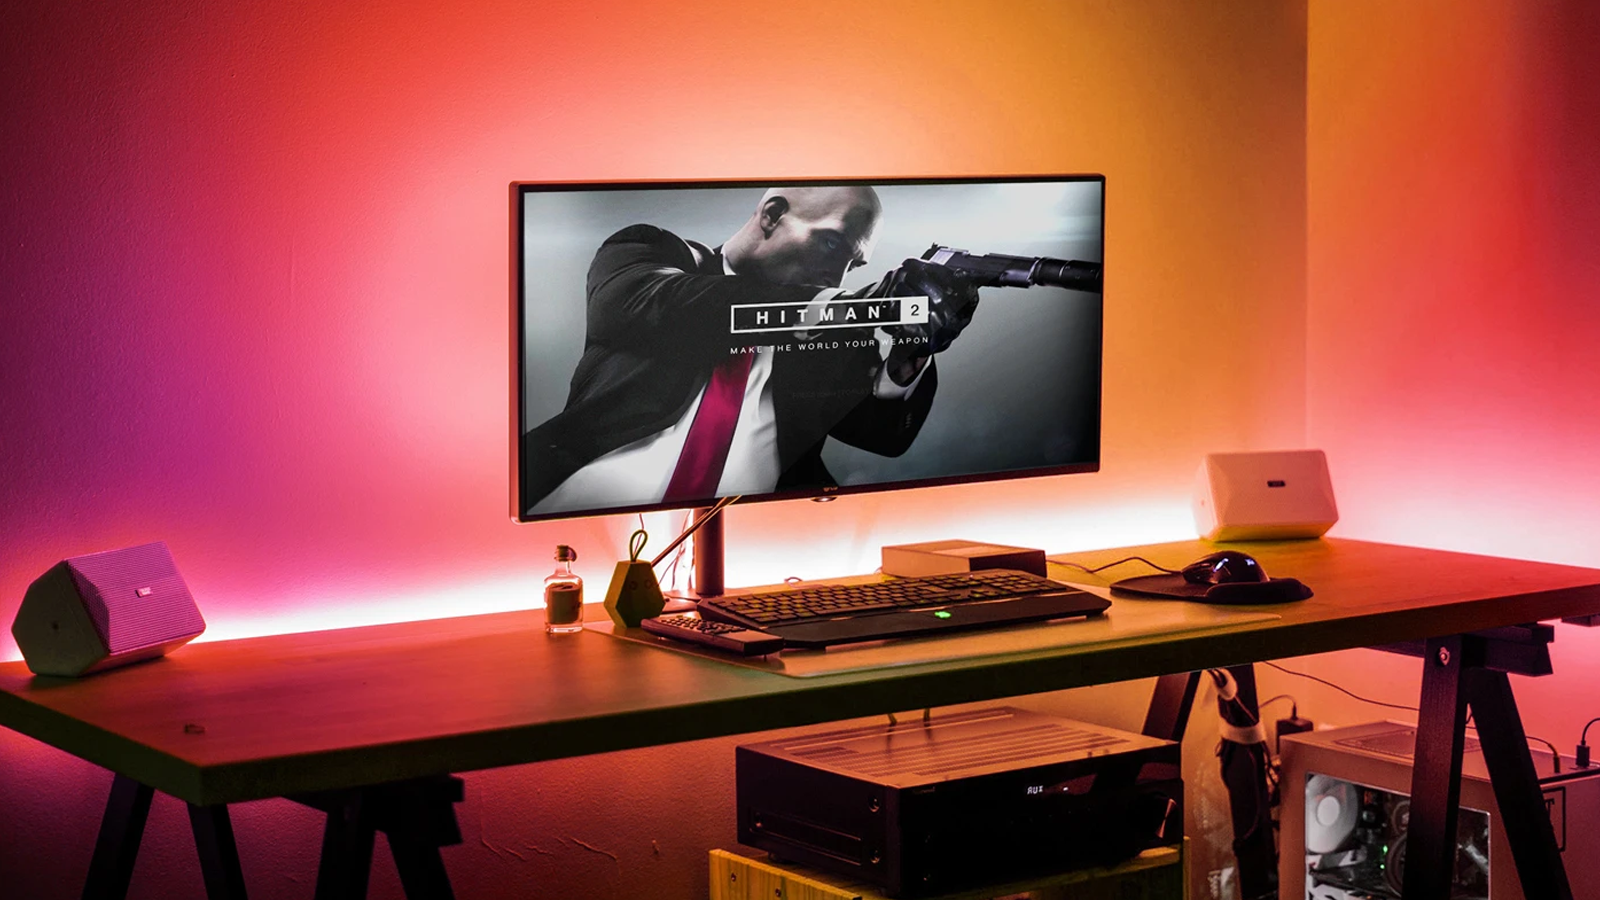 LIFX smart lighting at a gaming desk.